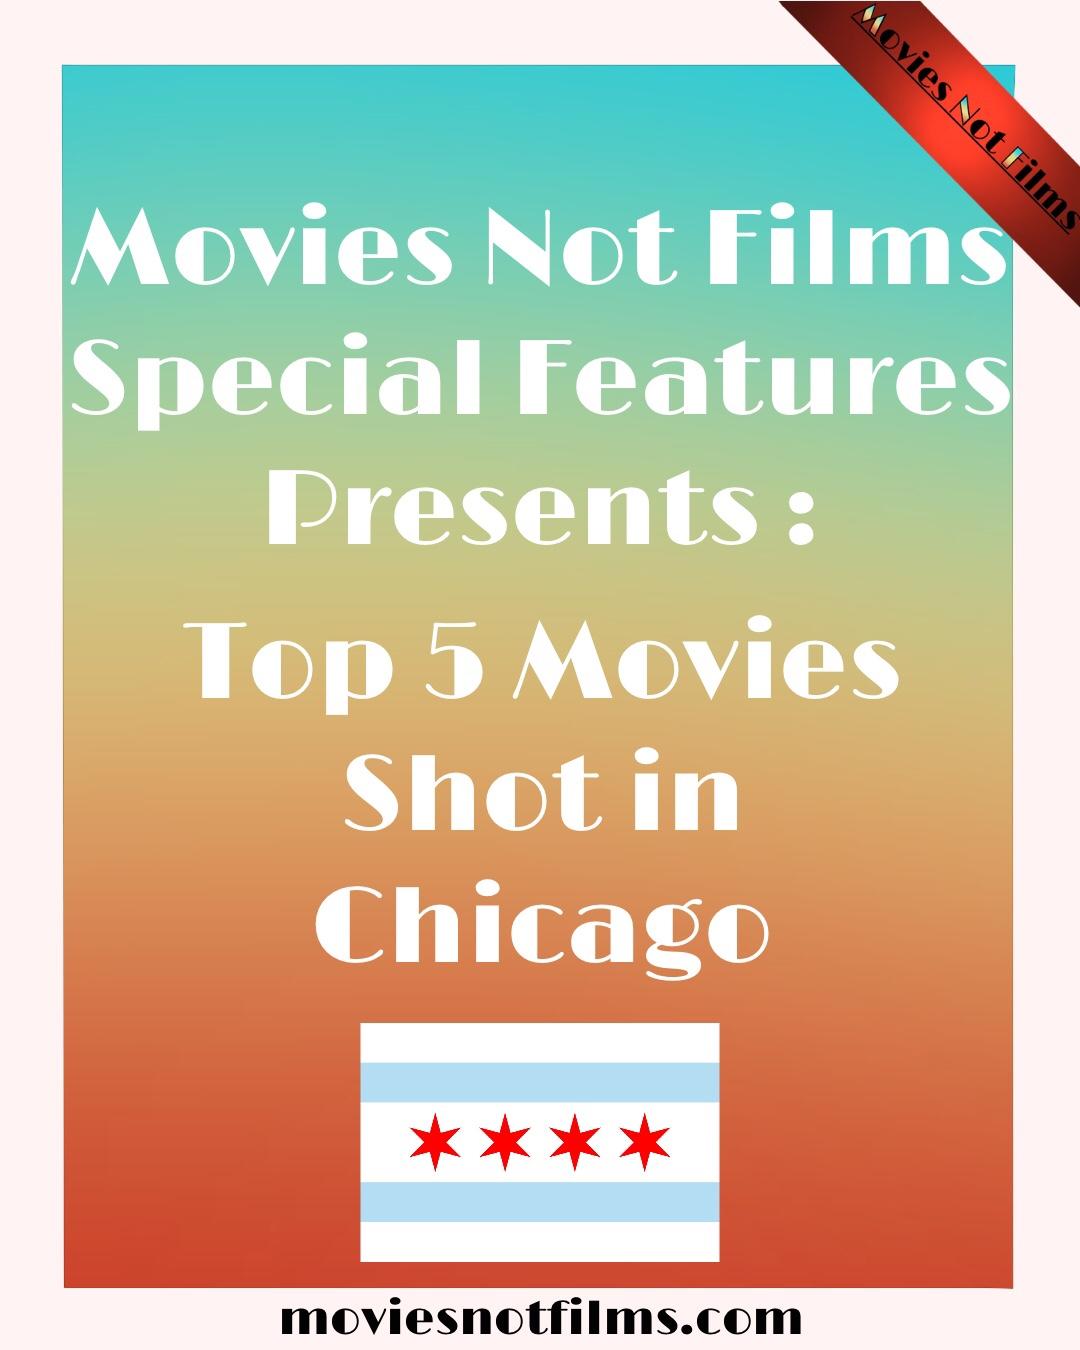 Top 5 shot in Chicago